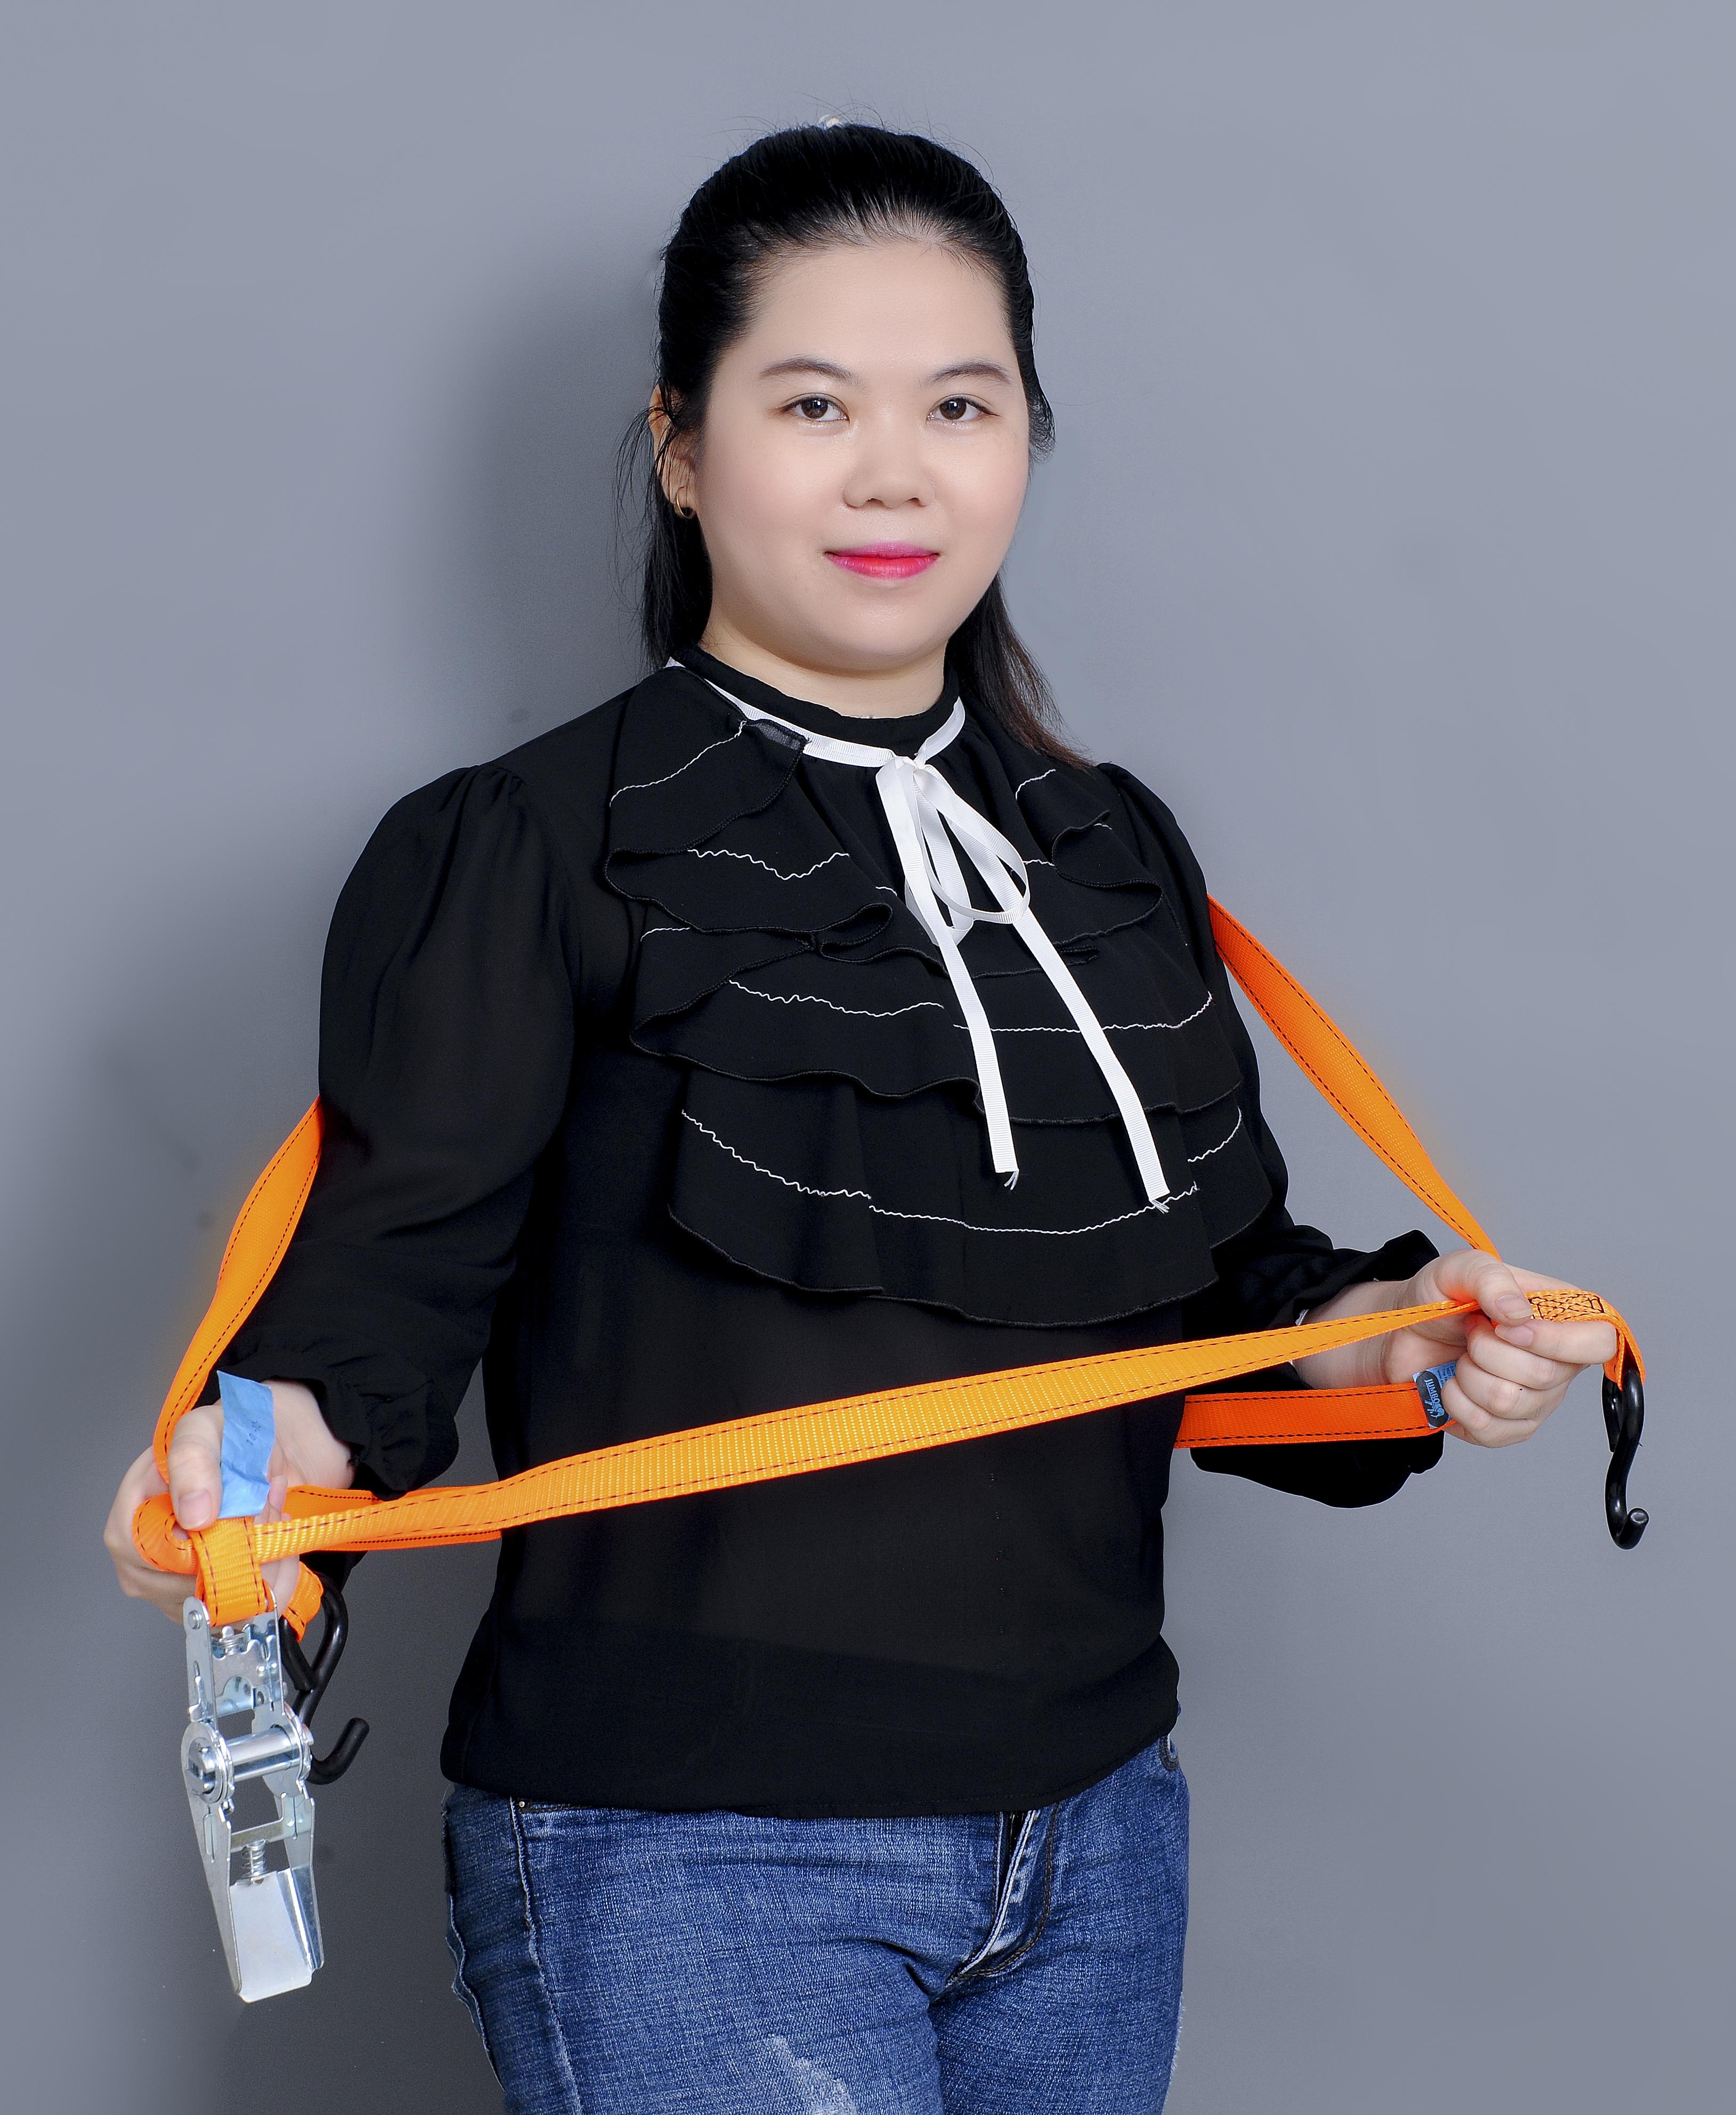 Ms Vi Tran